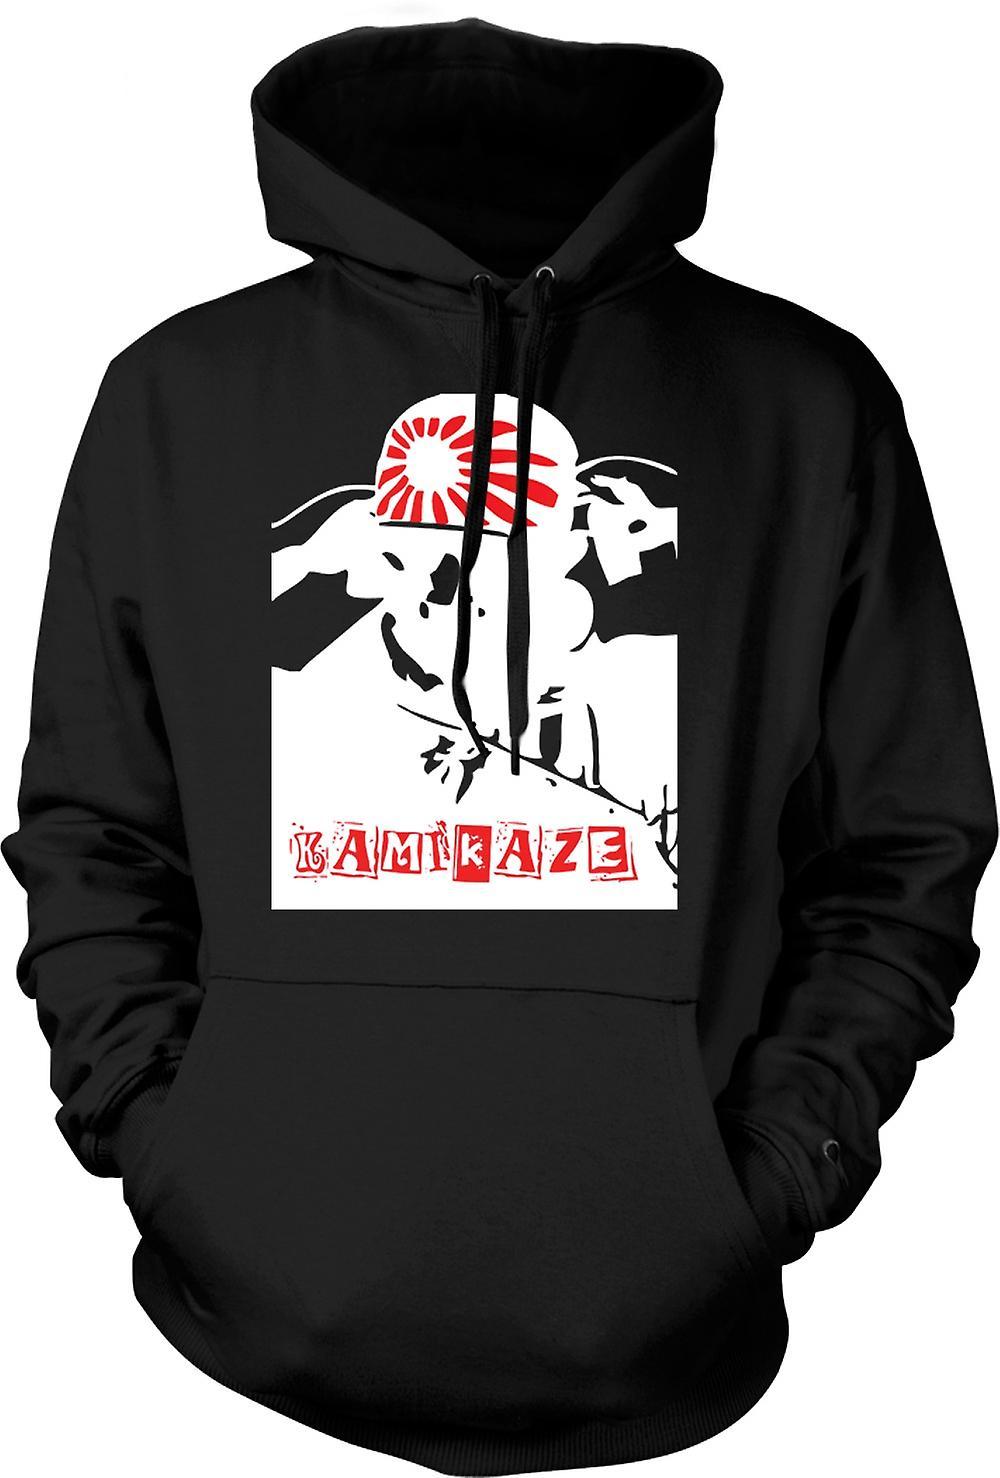 Mens Hoodie - Kamikaze Japanese - WW2 War